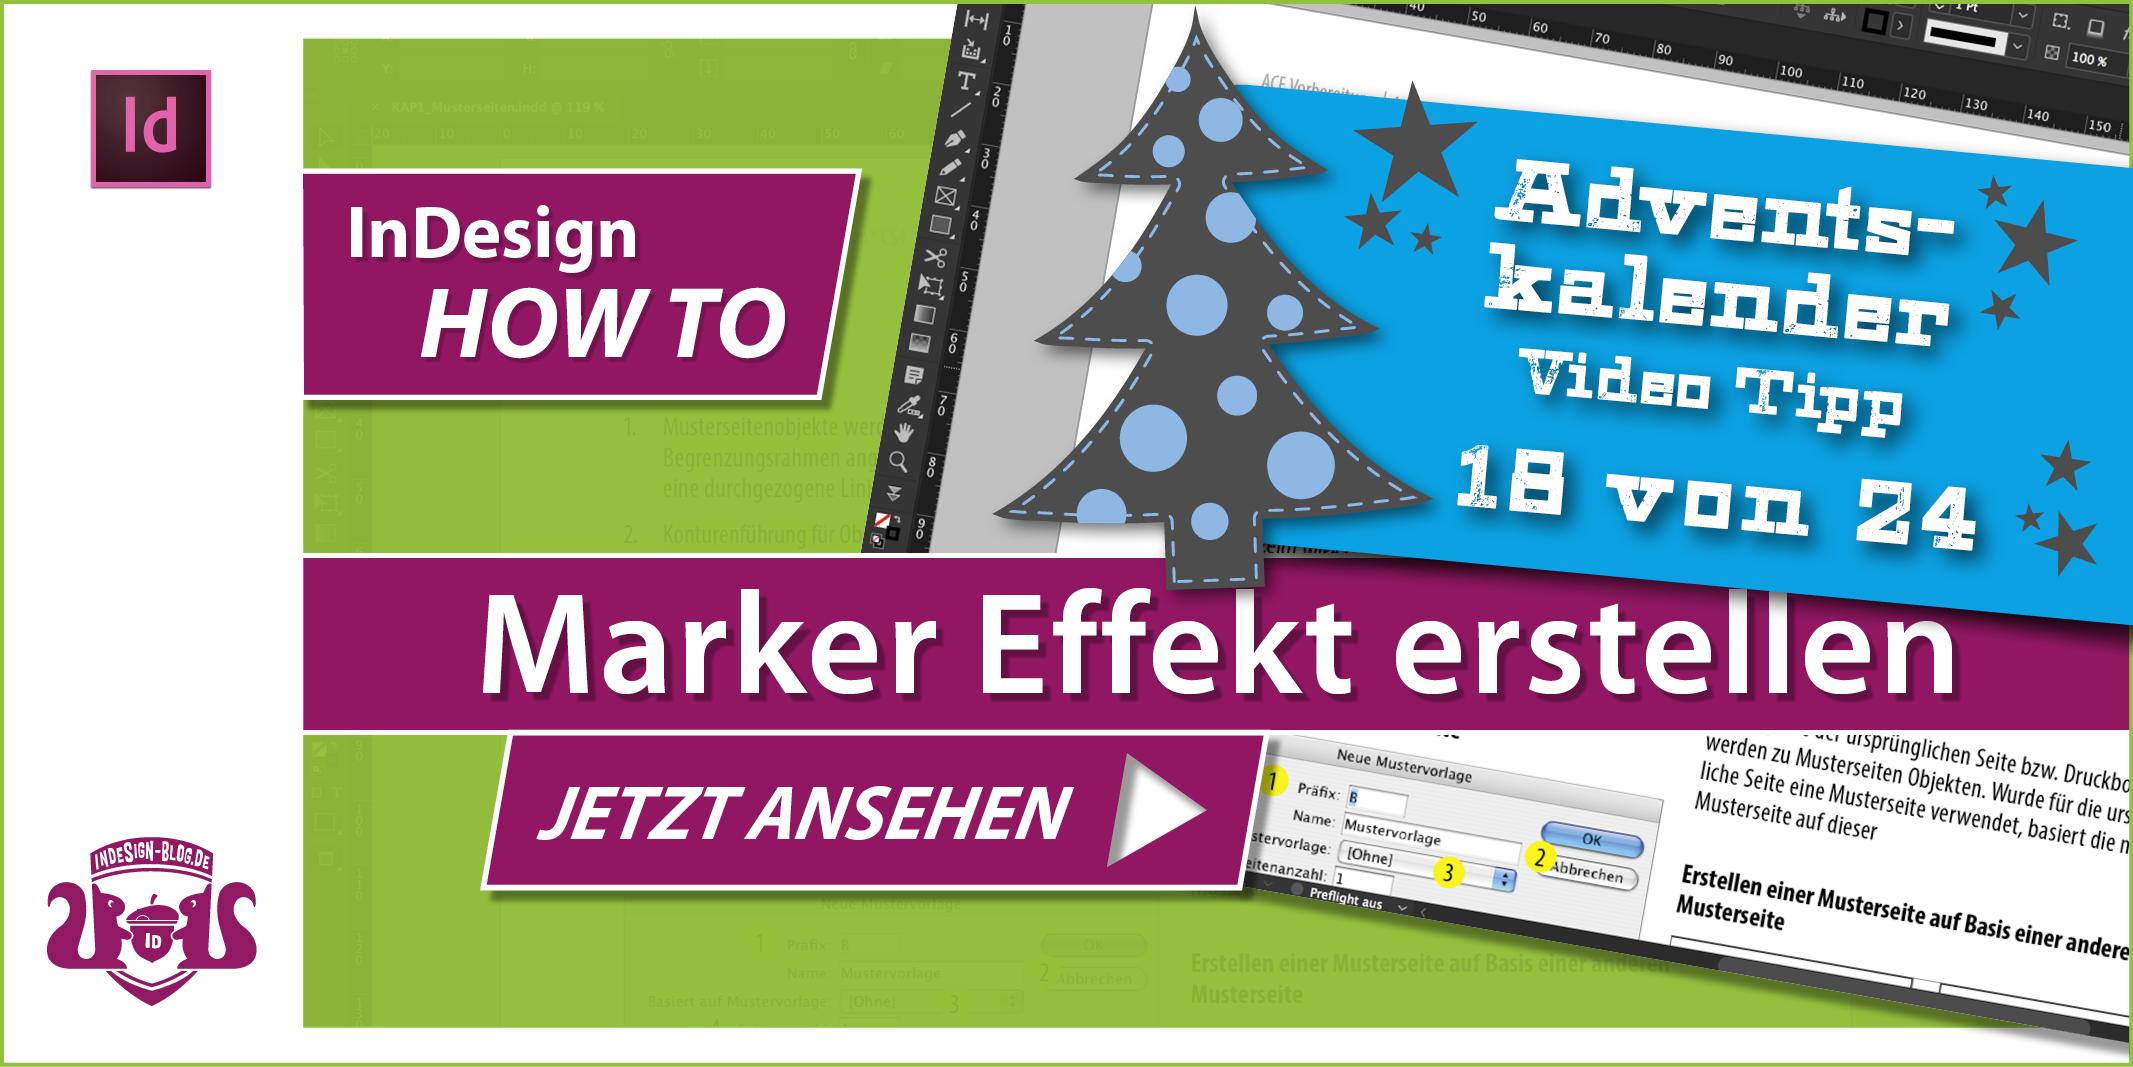 Tumbnail Marker Effekt erstellen in InDesign